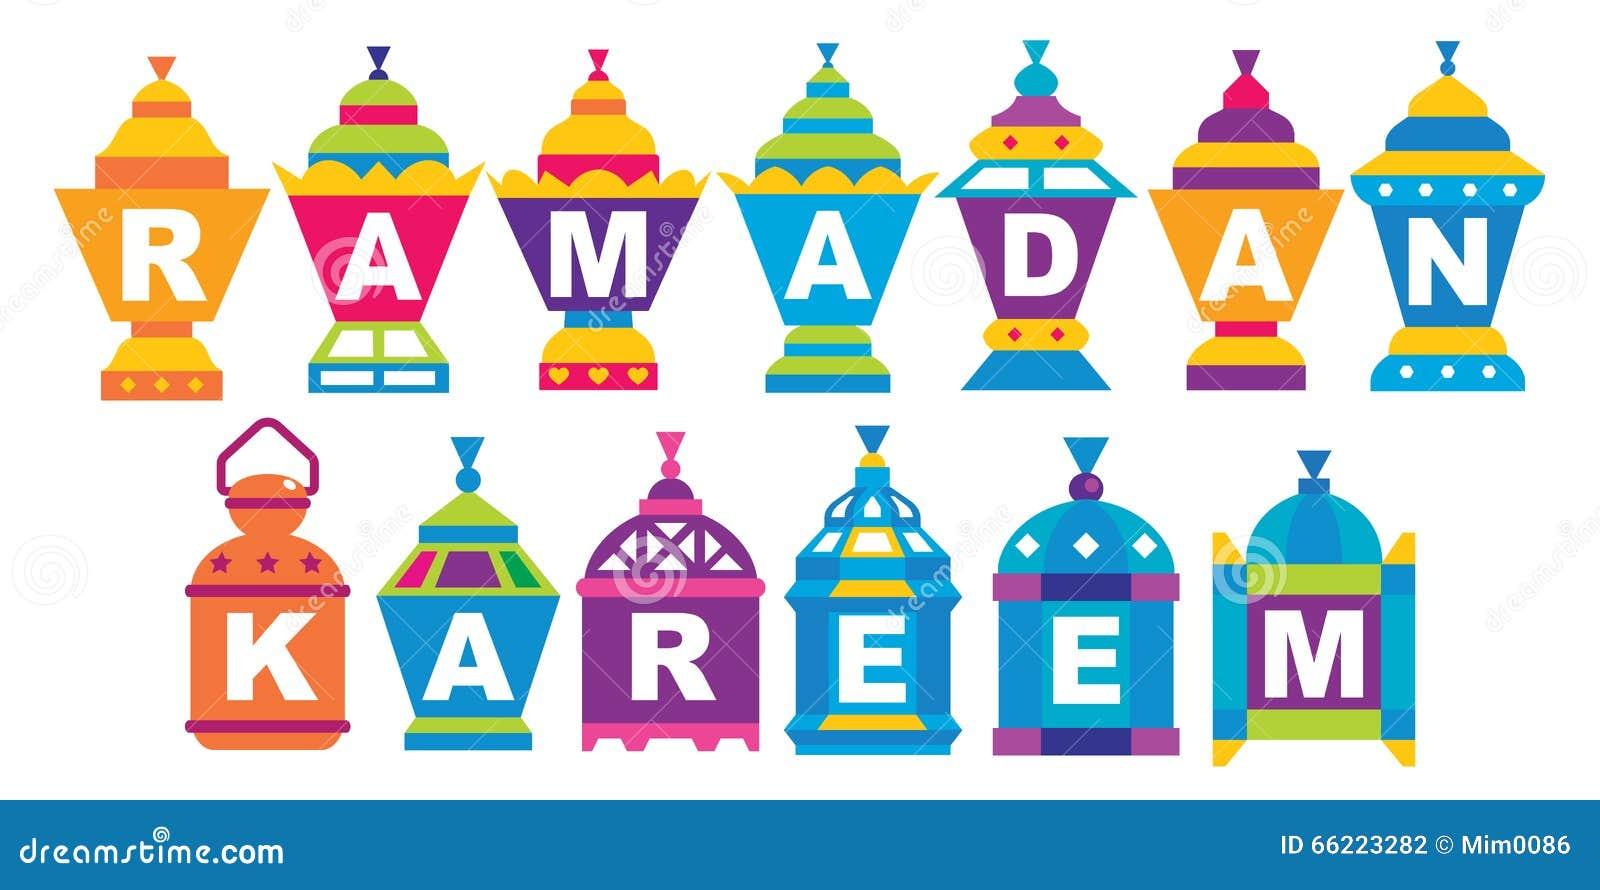 Ramadan 2018 How do you say happy Ramadan in Arabic